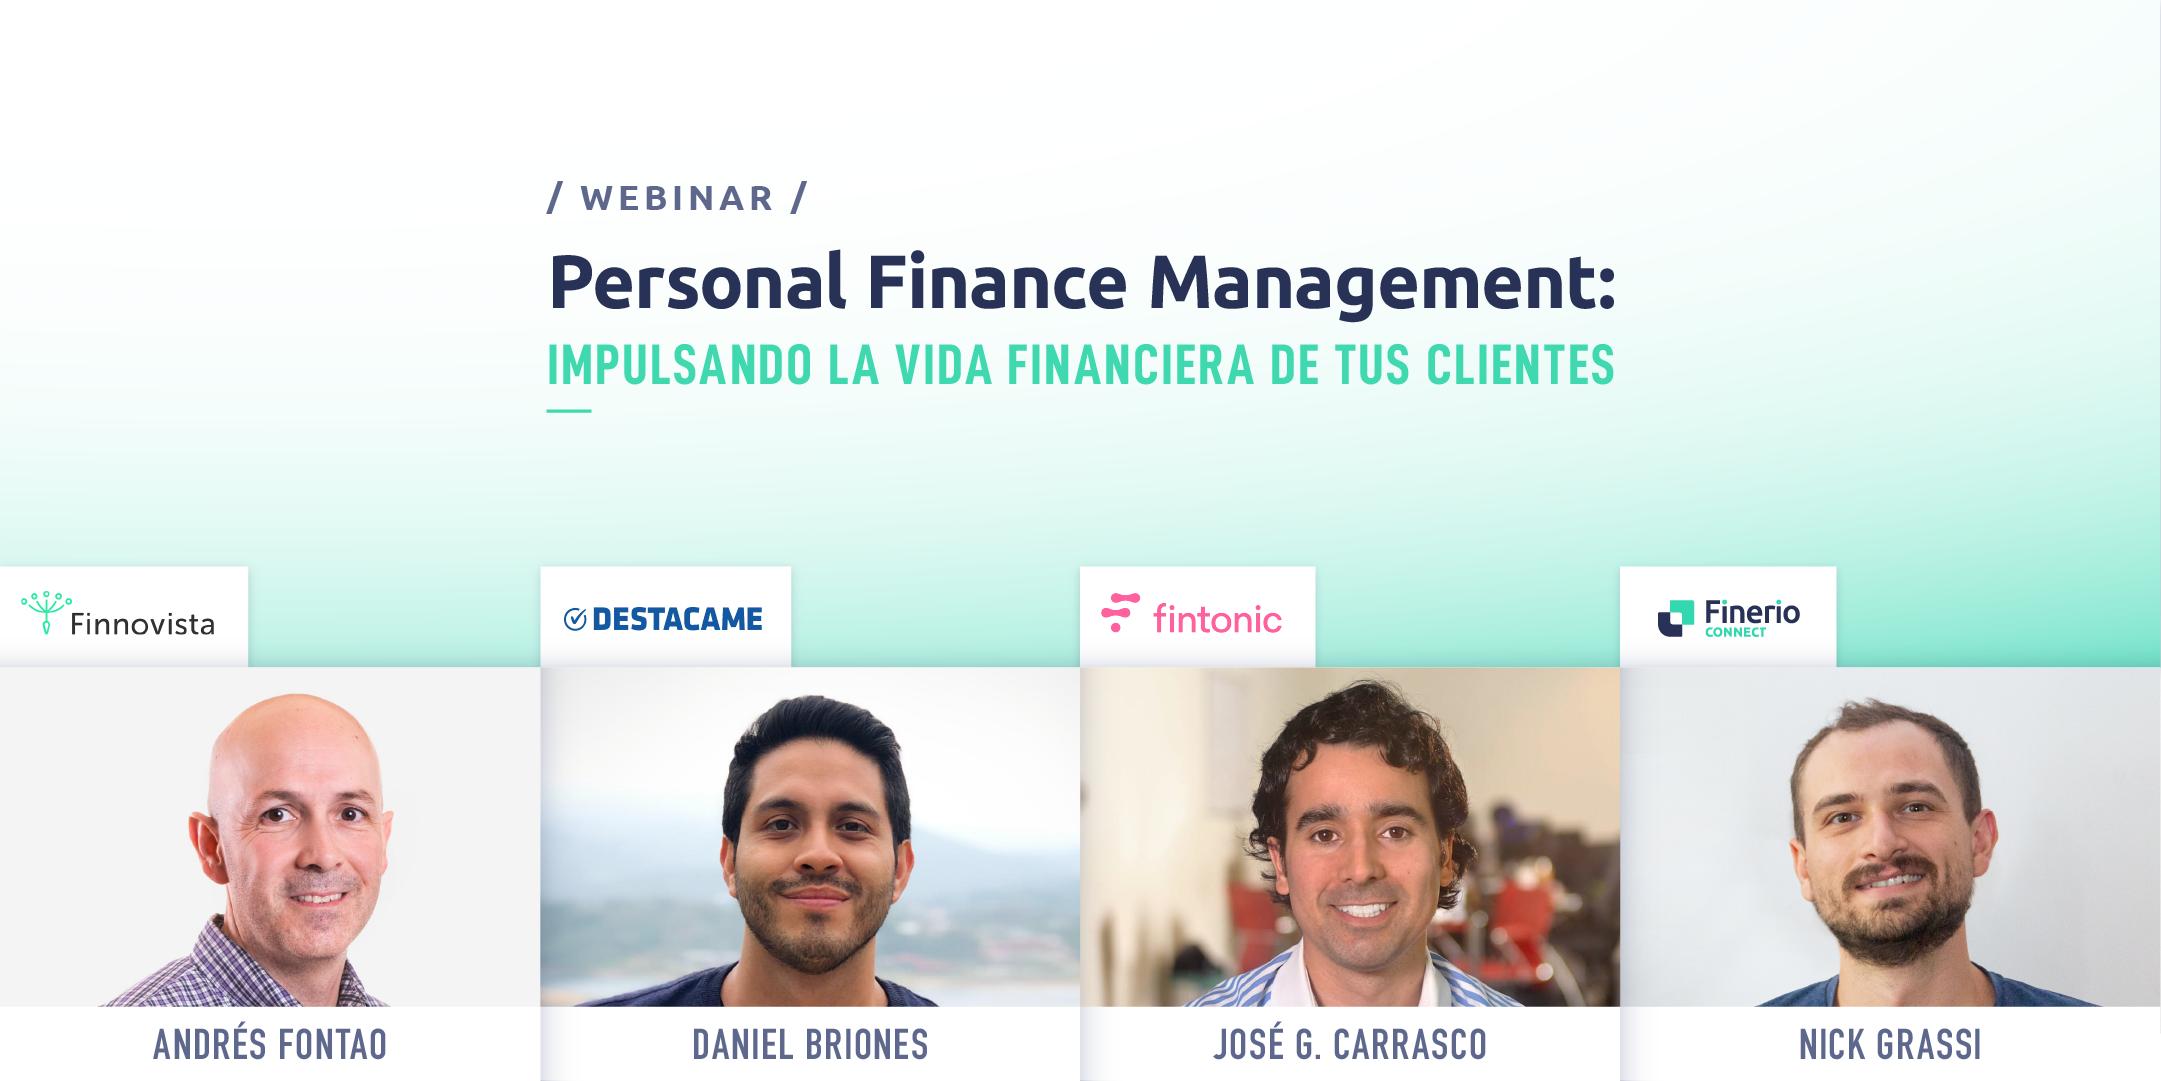 Webinar Personal Finance Management PFM